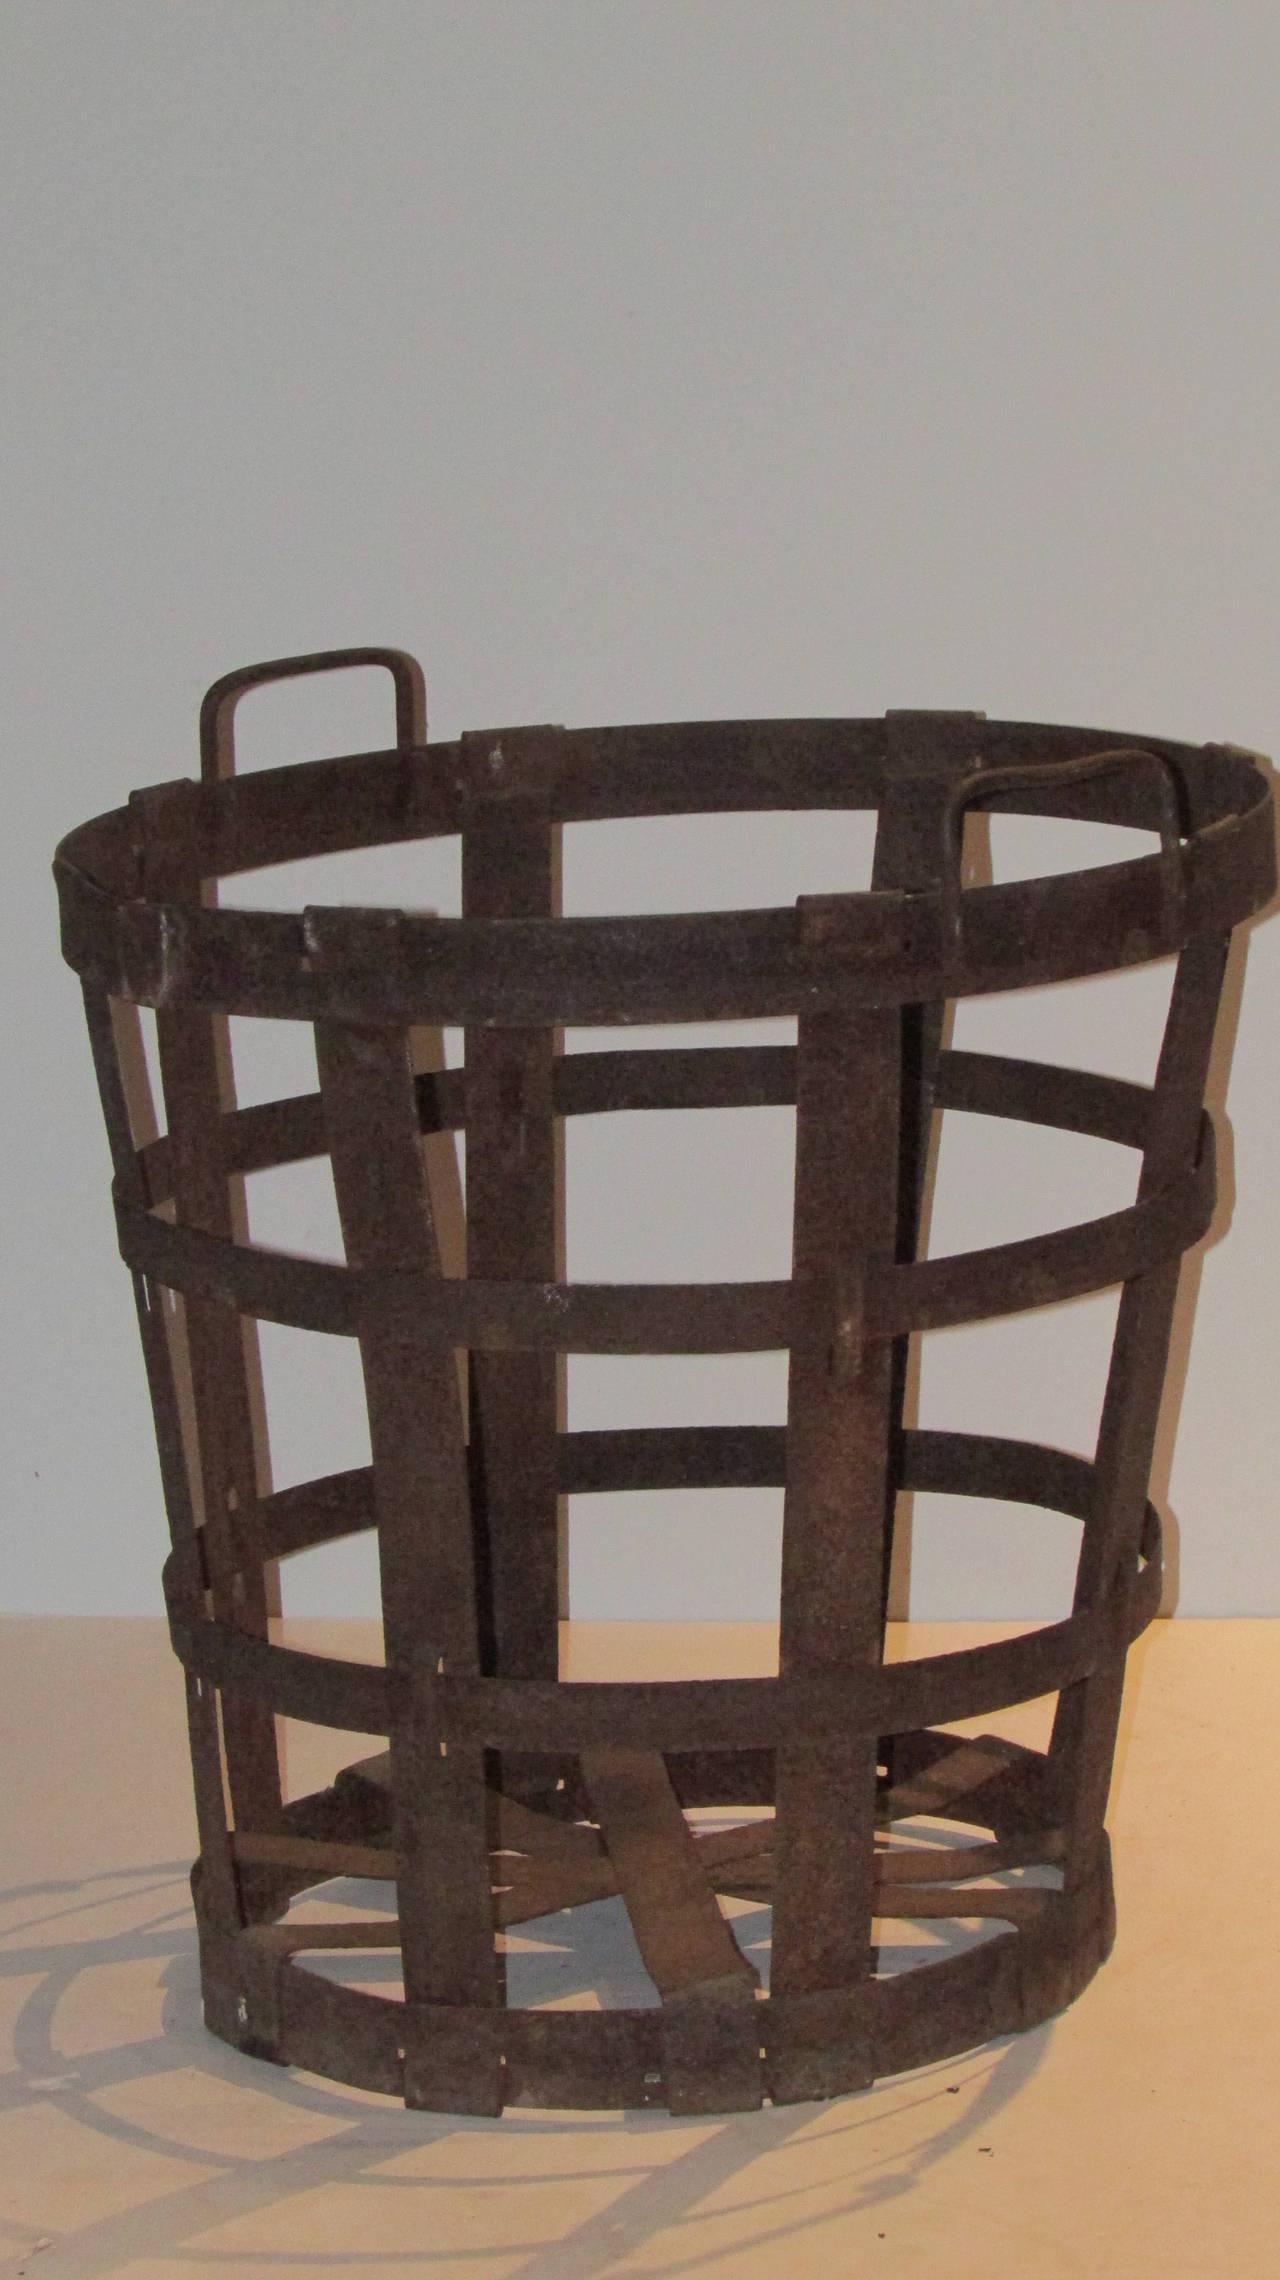 Rustic French Strap Metal Demijohn Basket At 1stdibs